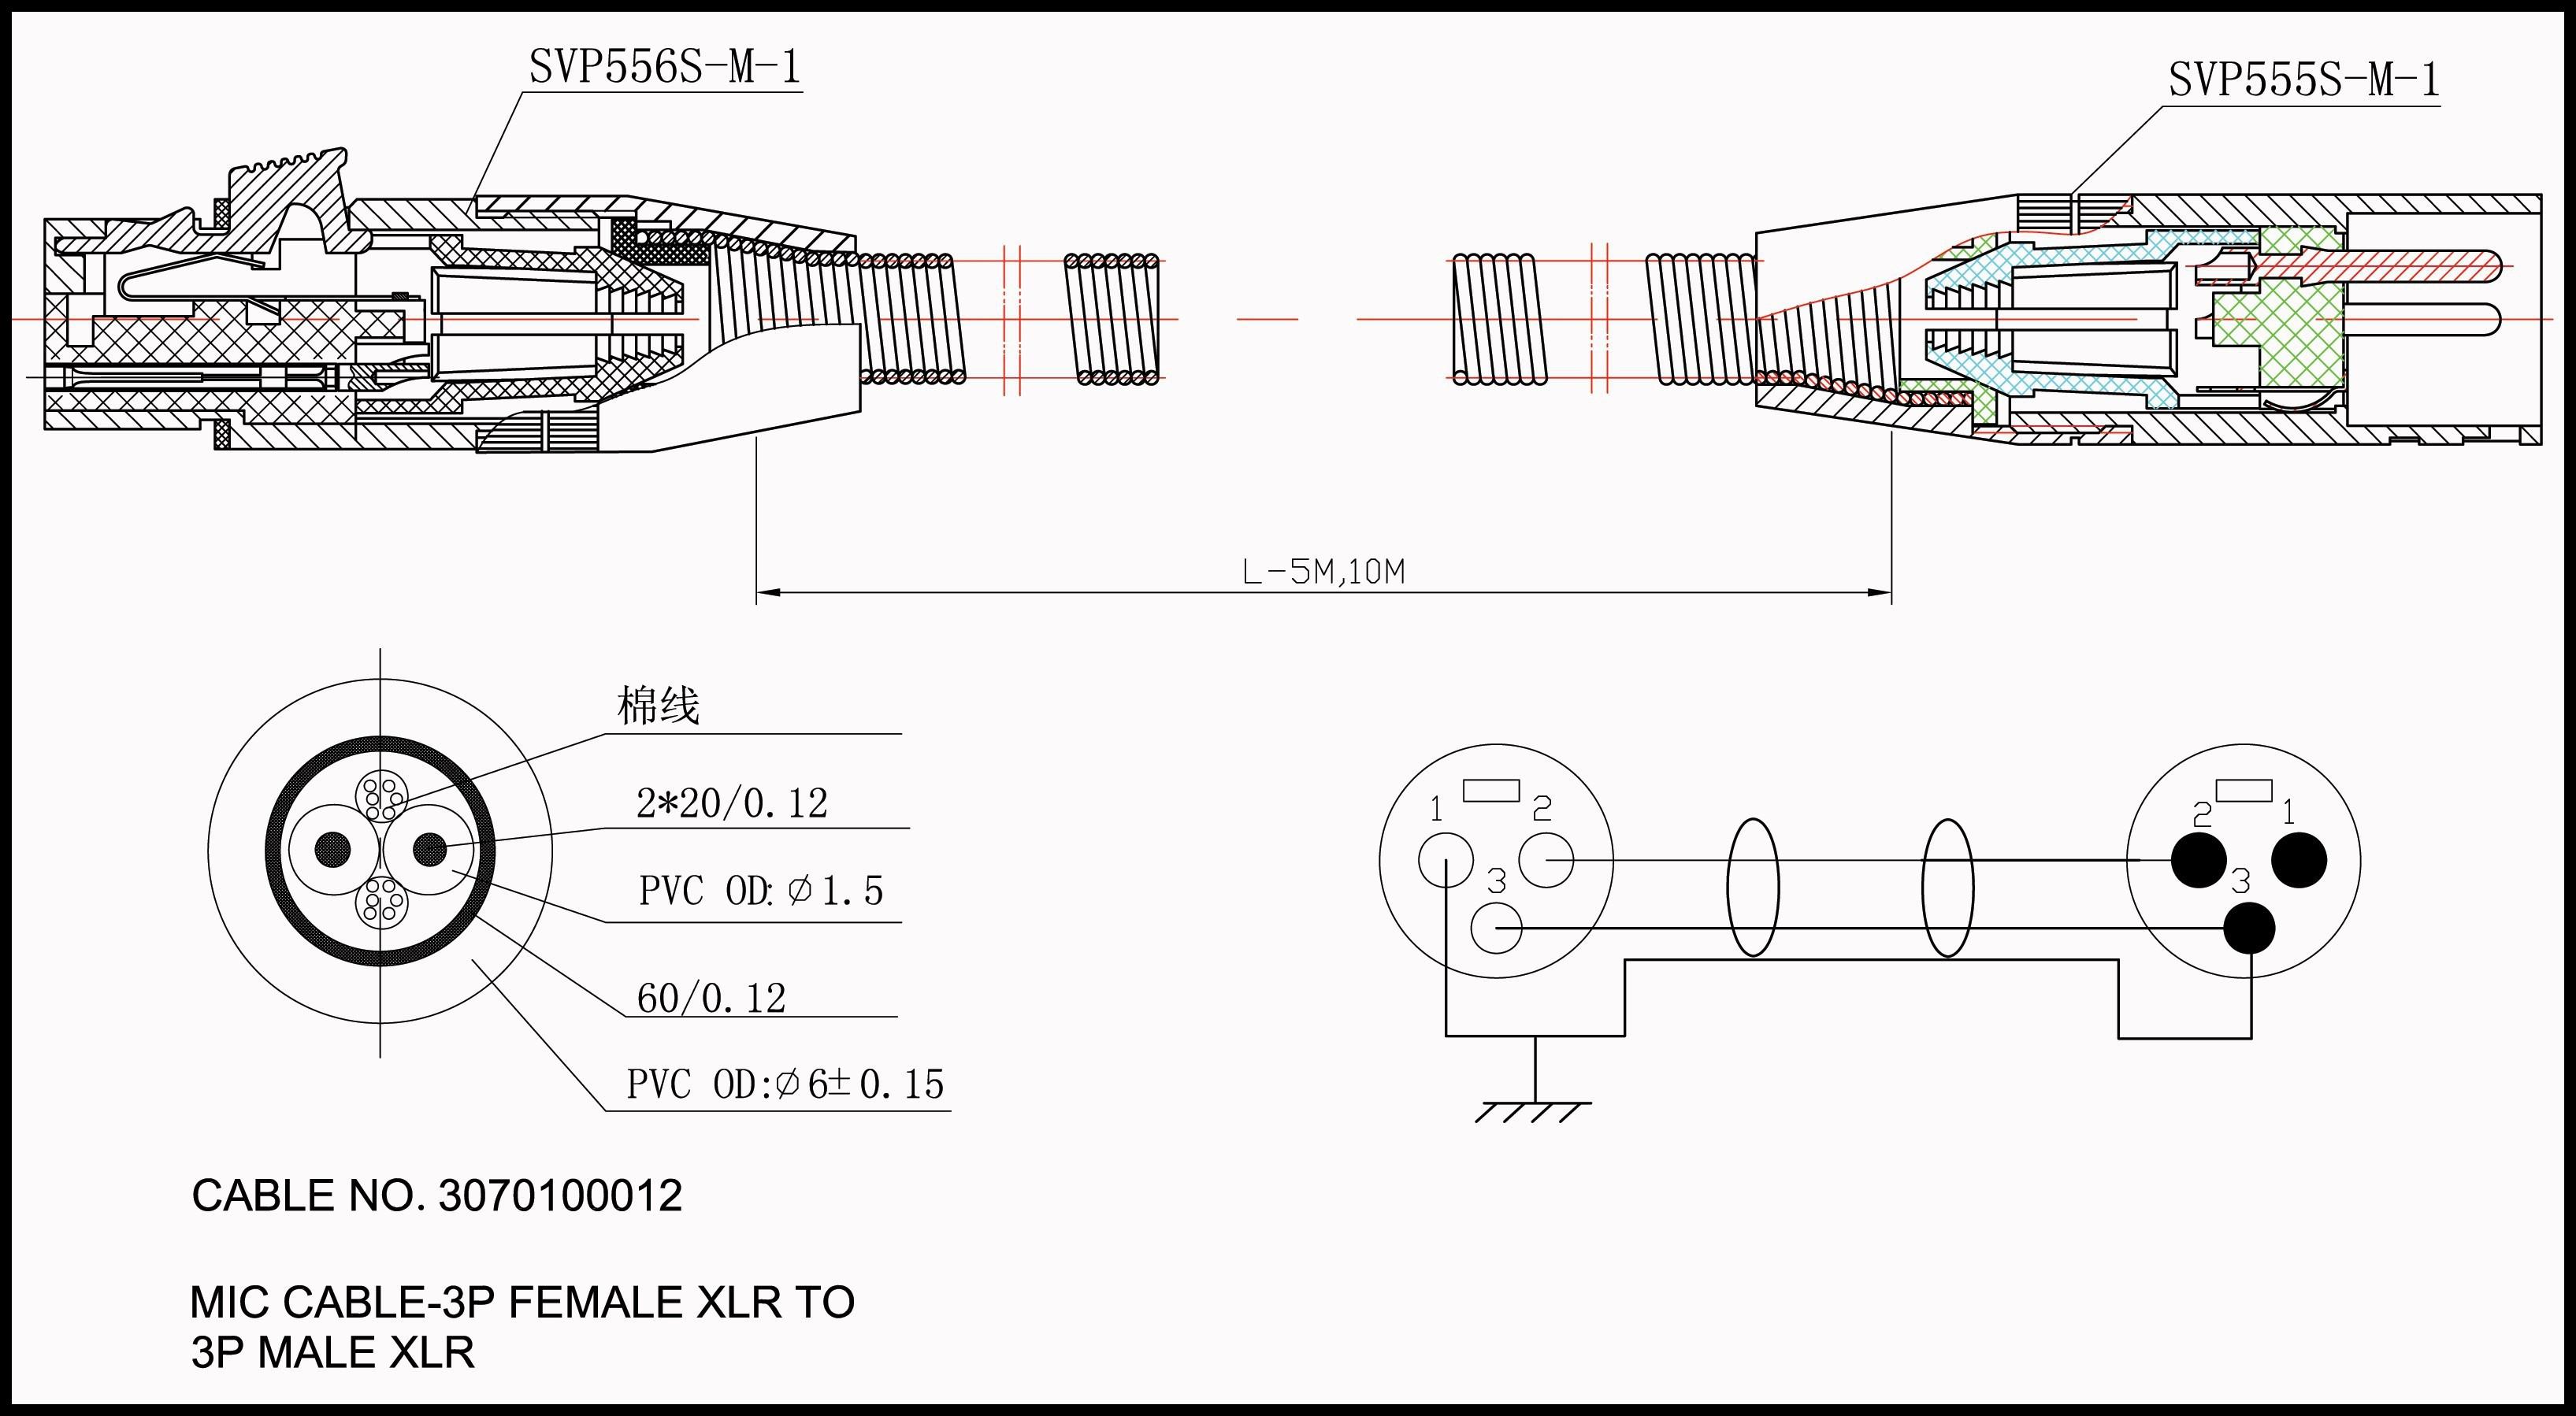 1999 toyota camry headlight wiring diagram reference 25 best circuit 2005 toyota camry wiring diagrams 1999